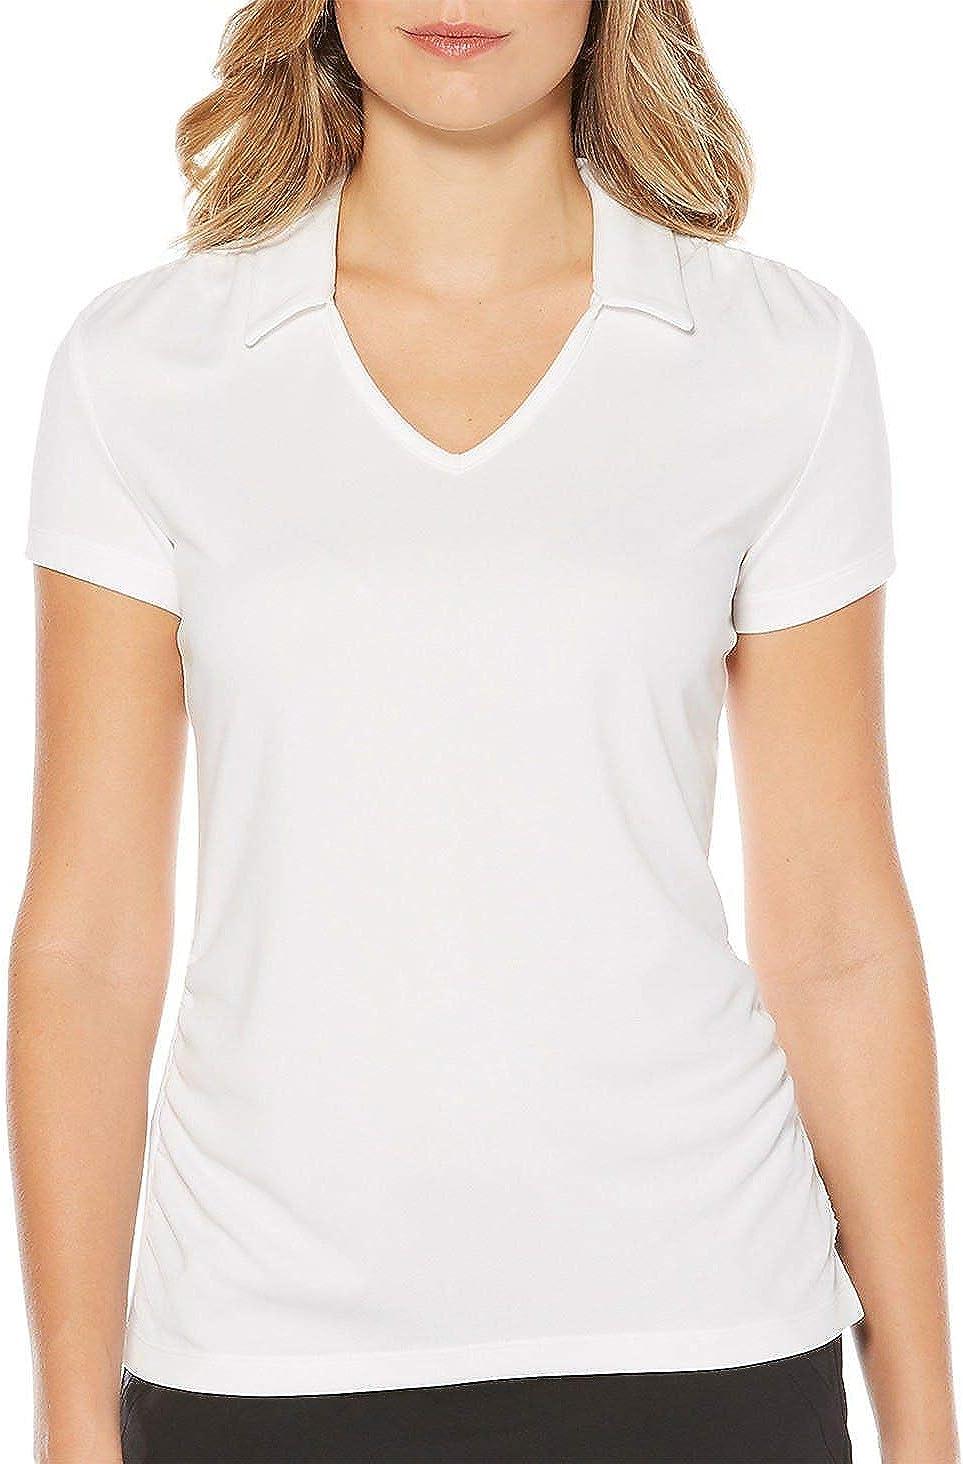 PGA TOUR Women's quality assurance Airflux Short Polo Sleeve Shirt Golf Outlet sale feature